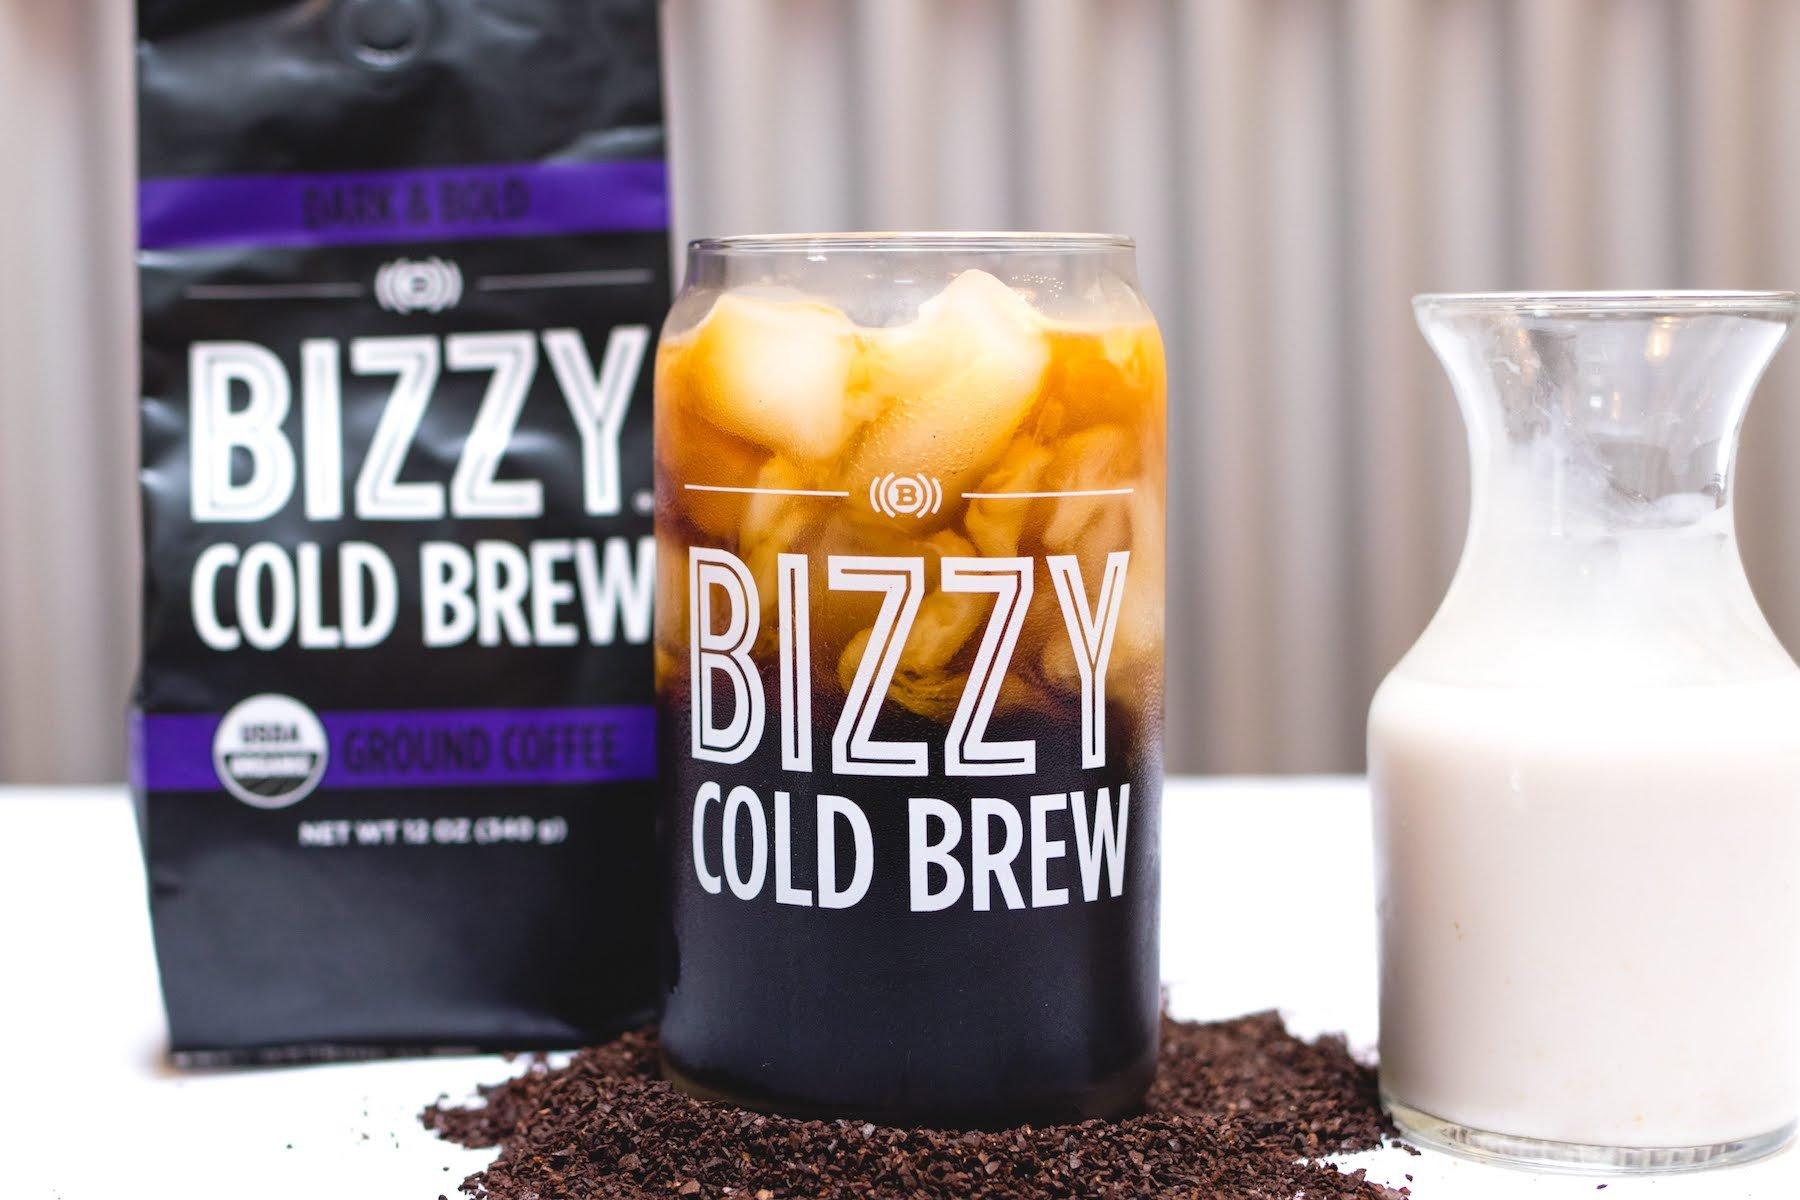 Bizzy Organic Cold Brew Coffee - Dark & Bold Blend - Coarse Ground Coffee - 12 oz by Bizzy (Image #7)